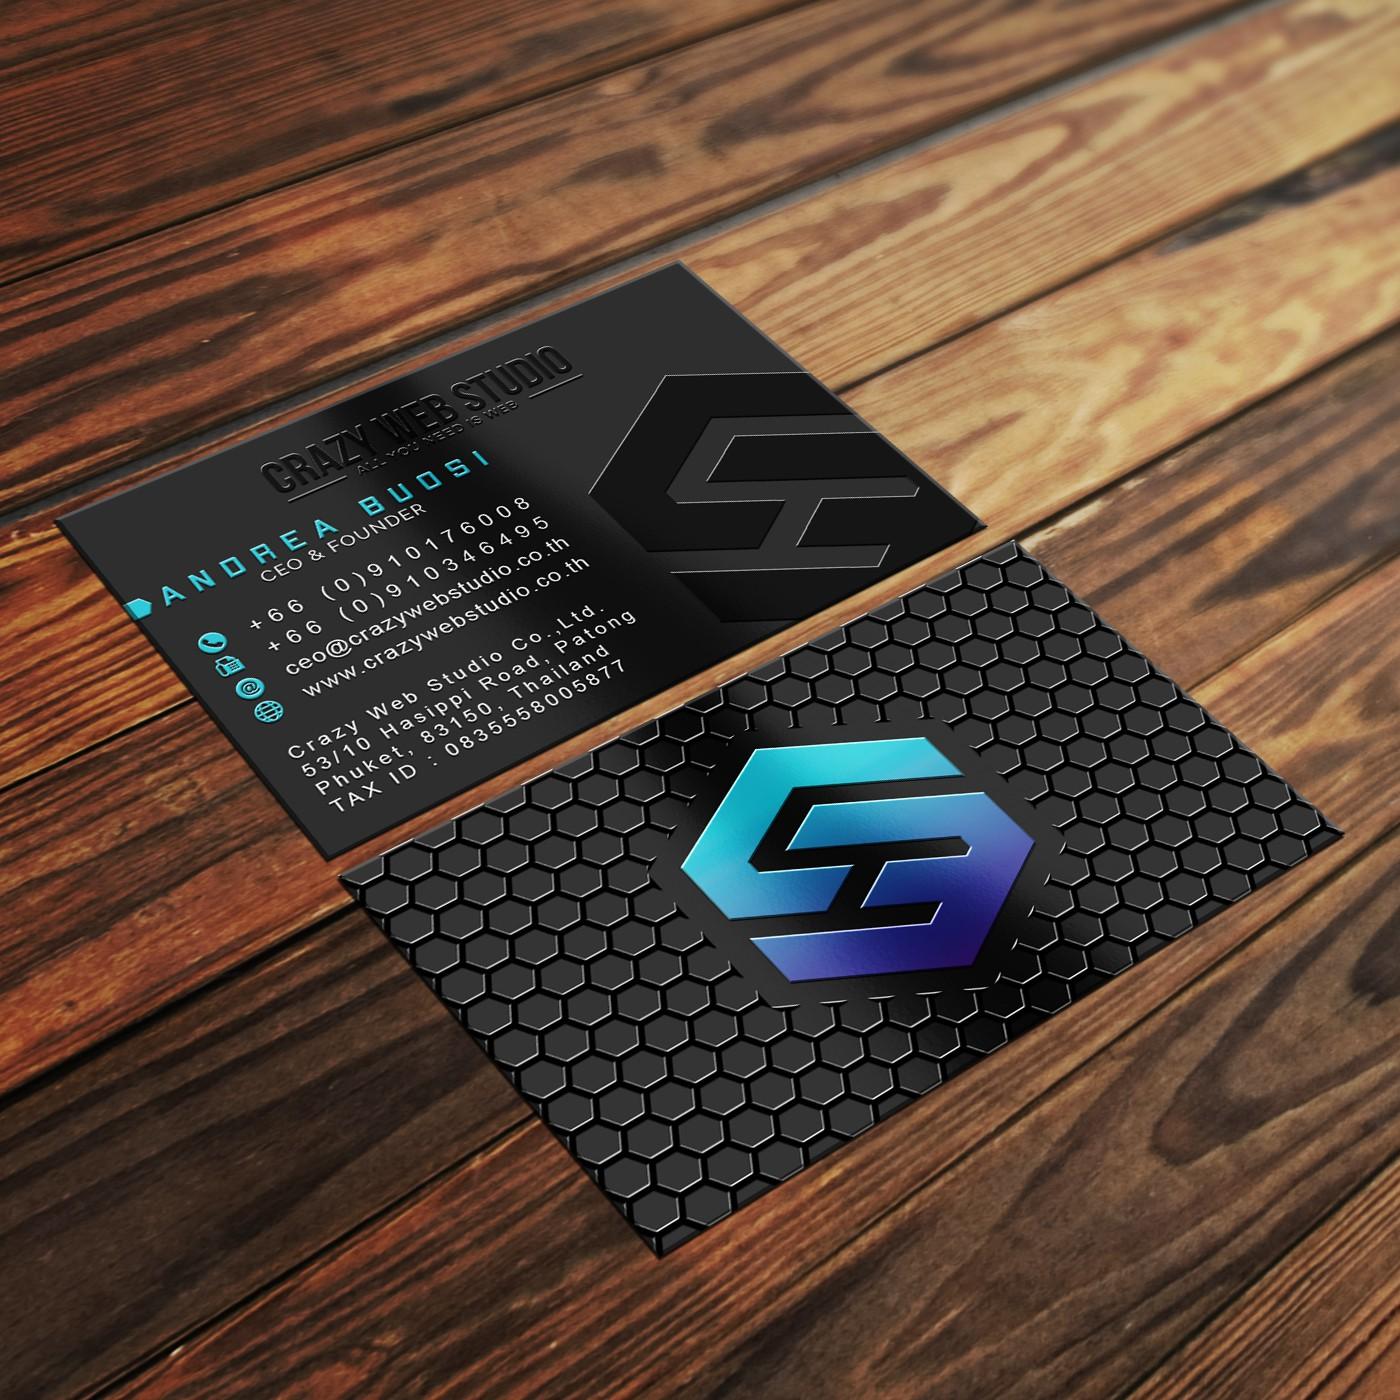 CWS Website Company needs a fresh logo restyle!